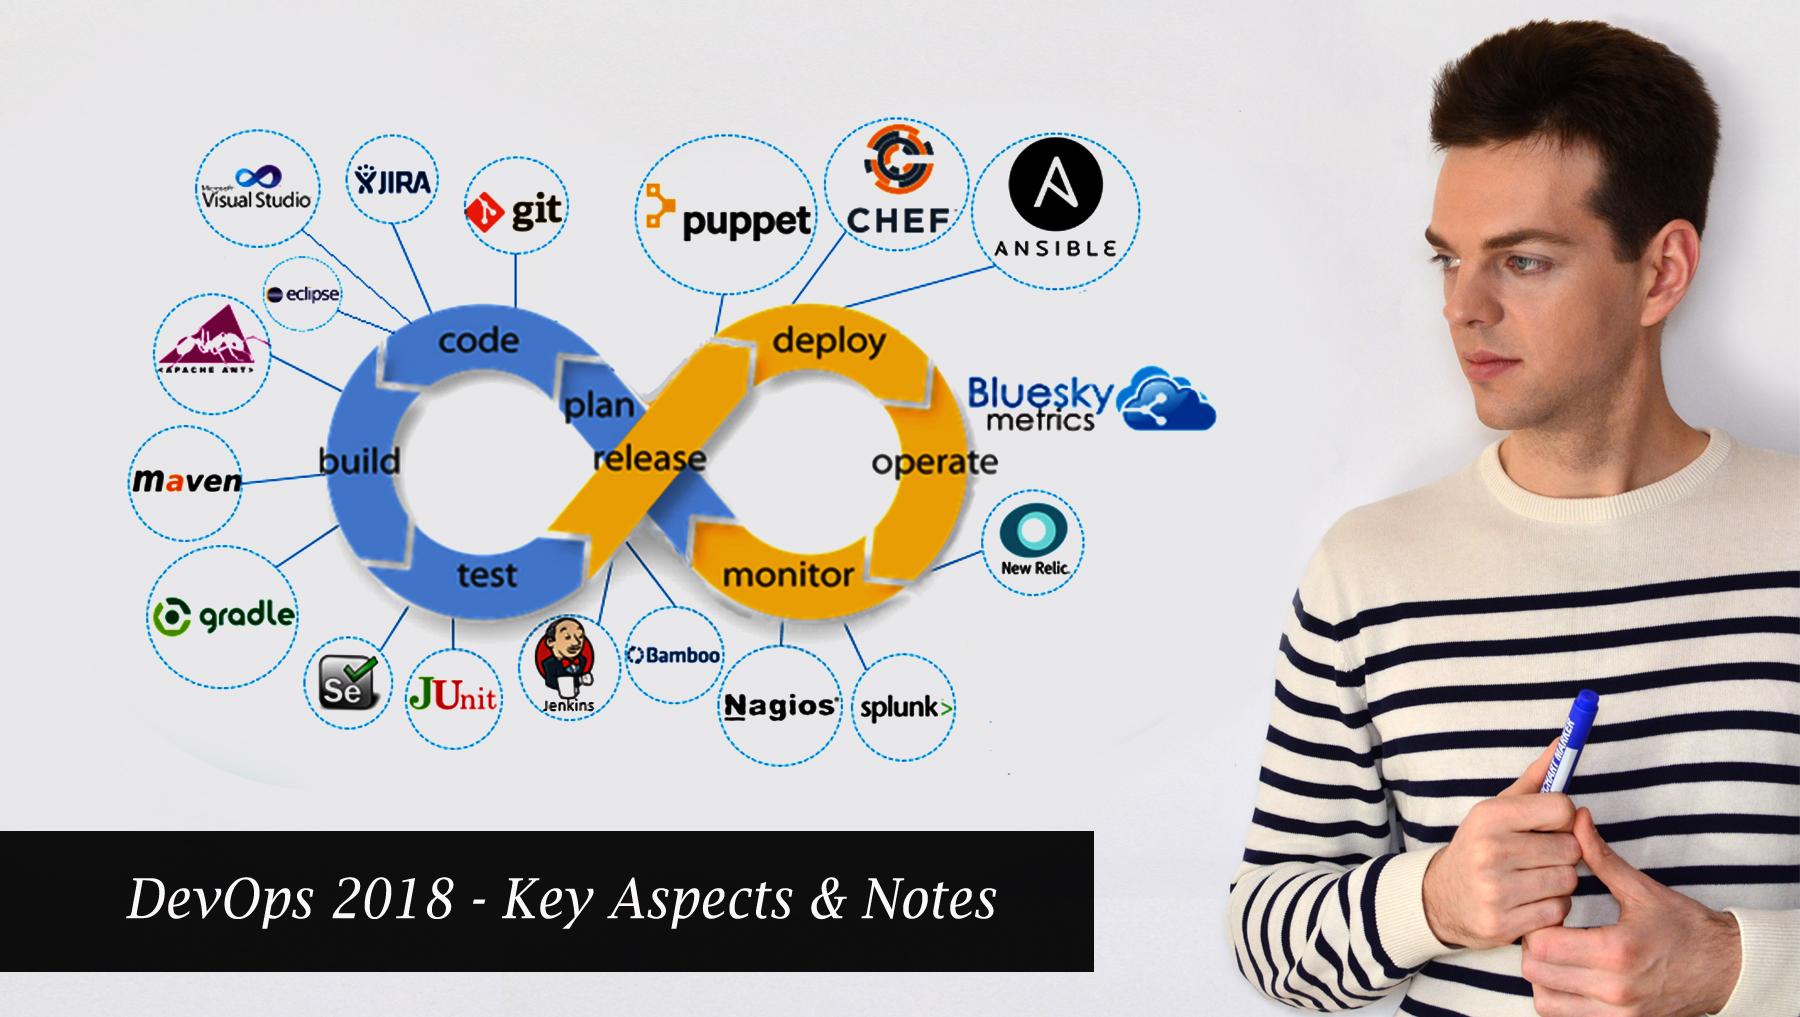 DevOps 2018 - Key Aspects & Notes